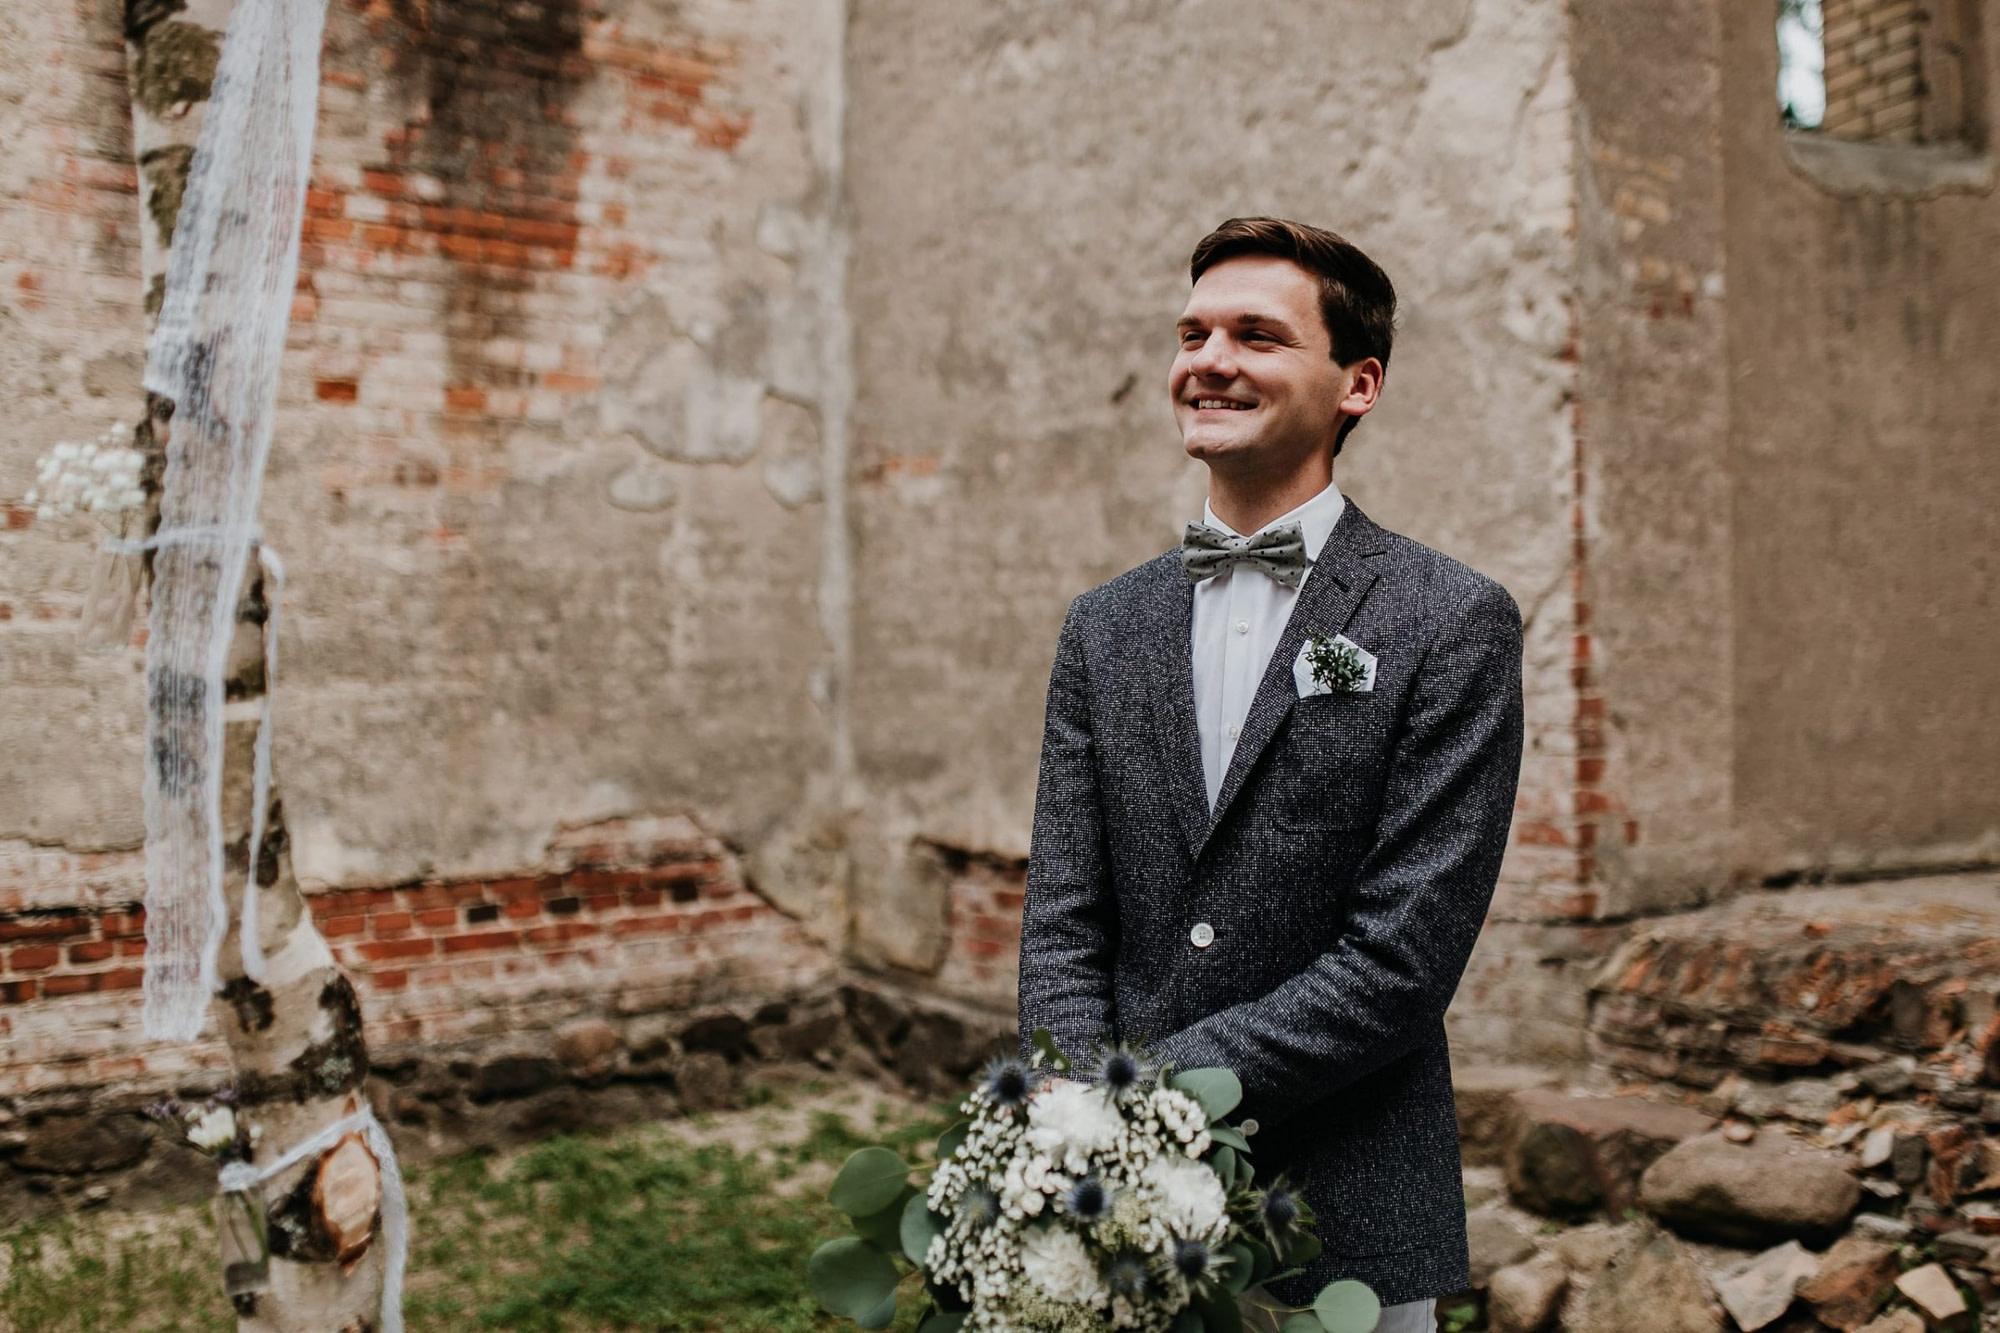 boho wedding, hochzeit berlin, braut, groom, bride, bräutigam, trauung, freie trauung, ceremony, groom wating